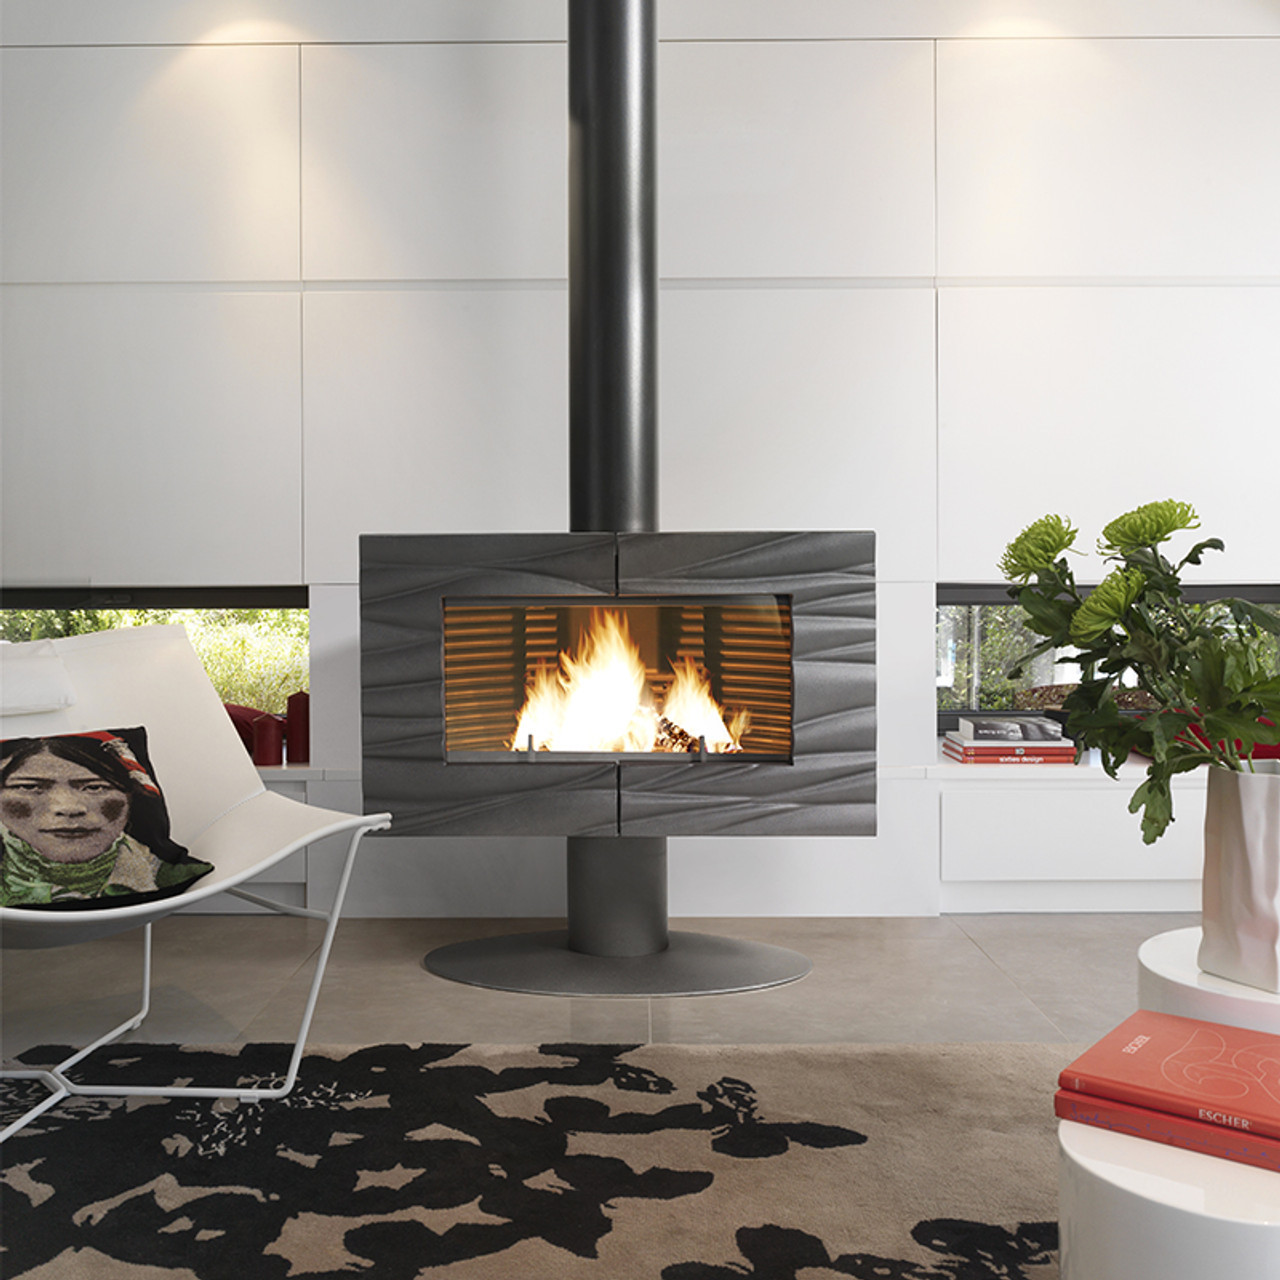 Invicta wood burning fireplace Gaya Feuille